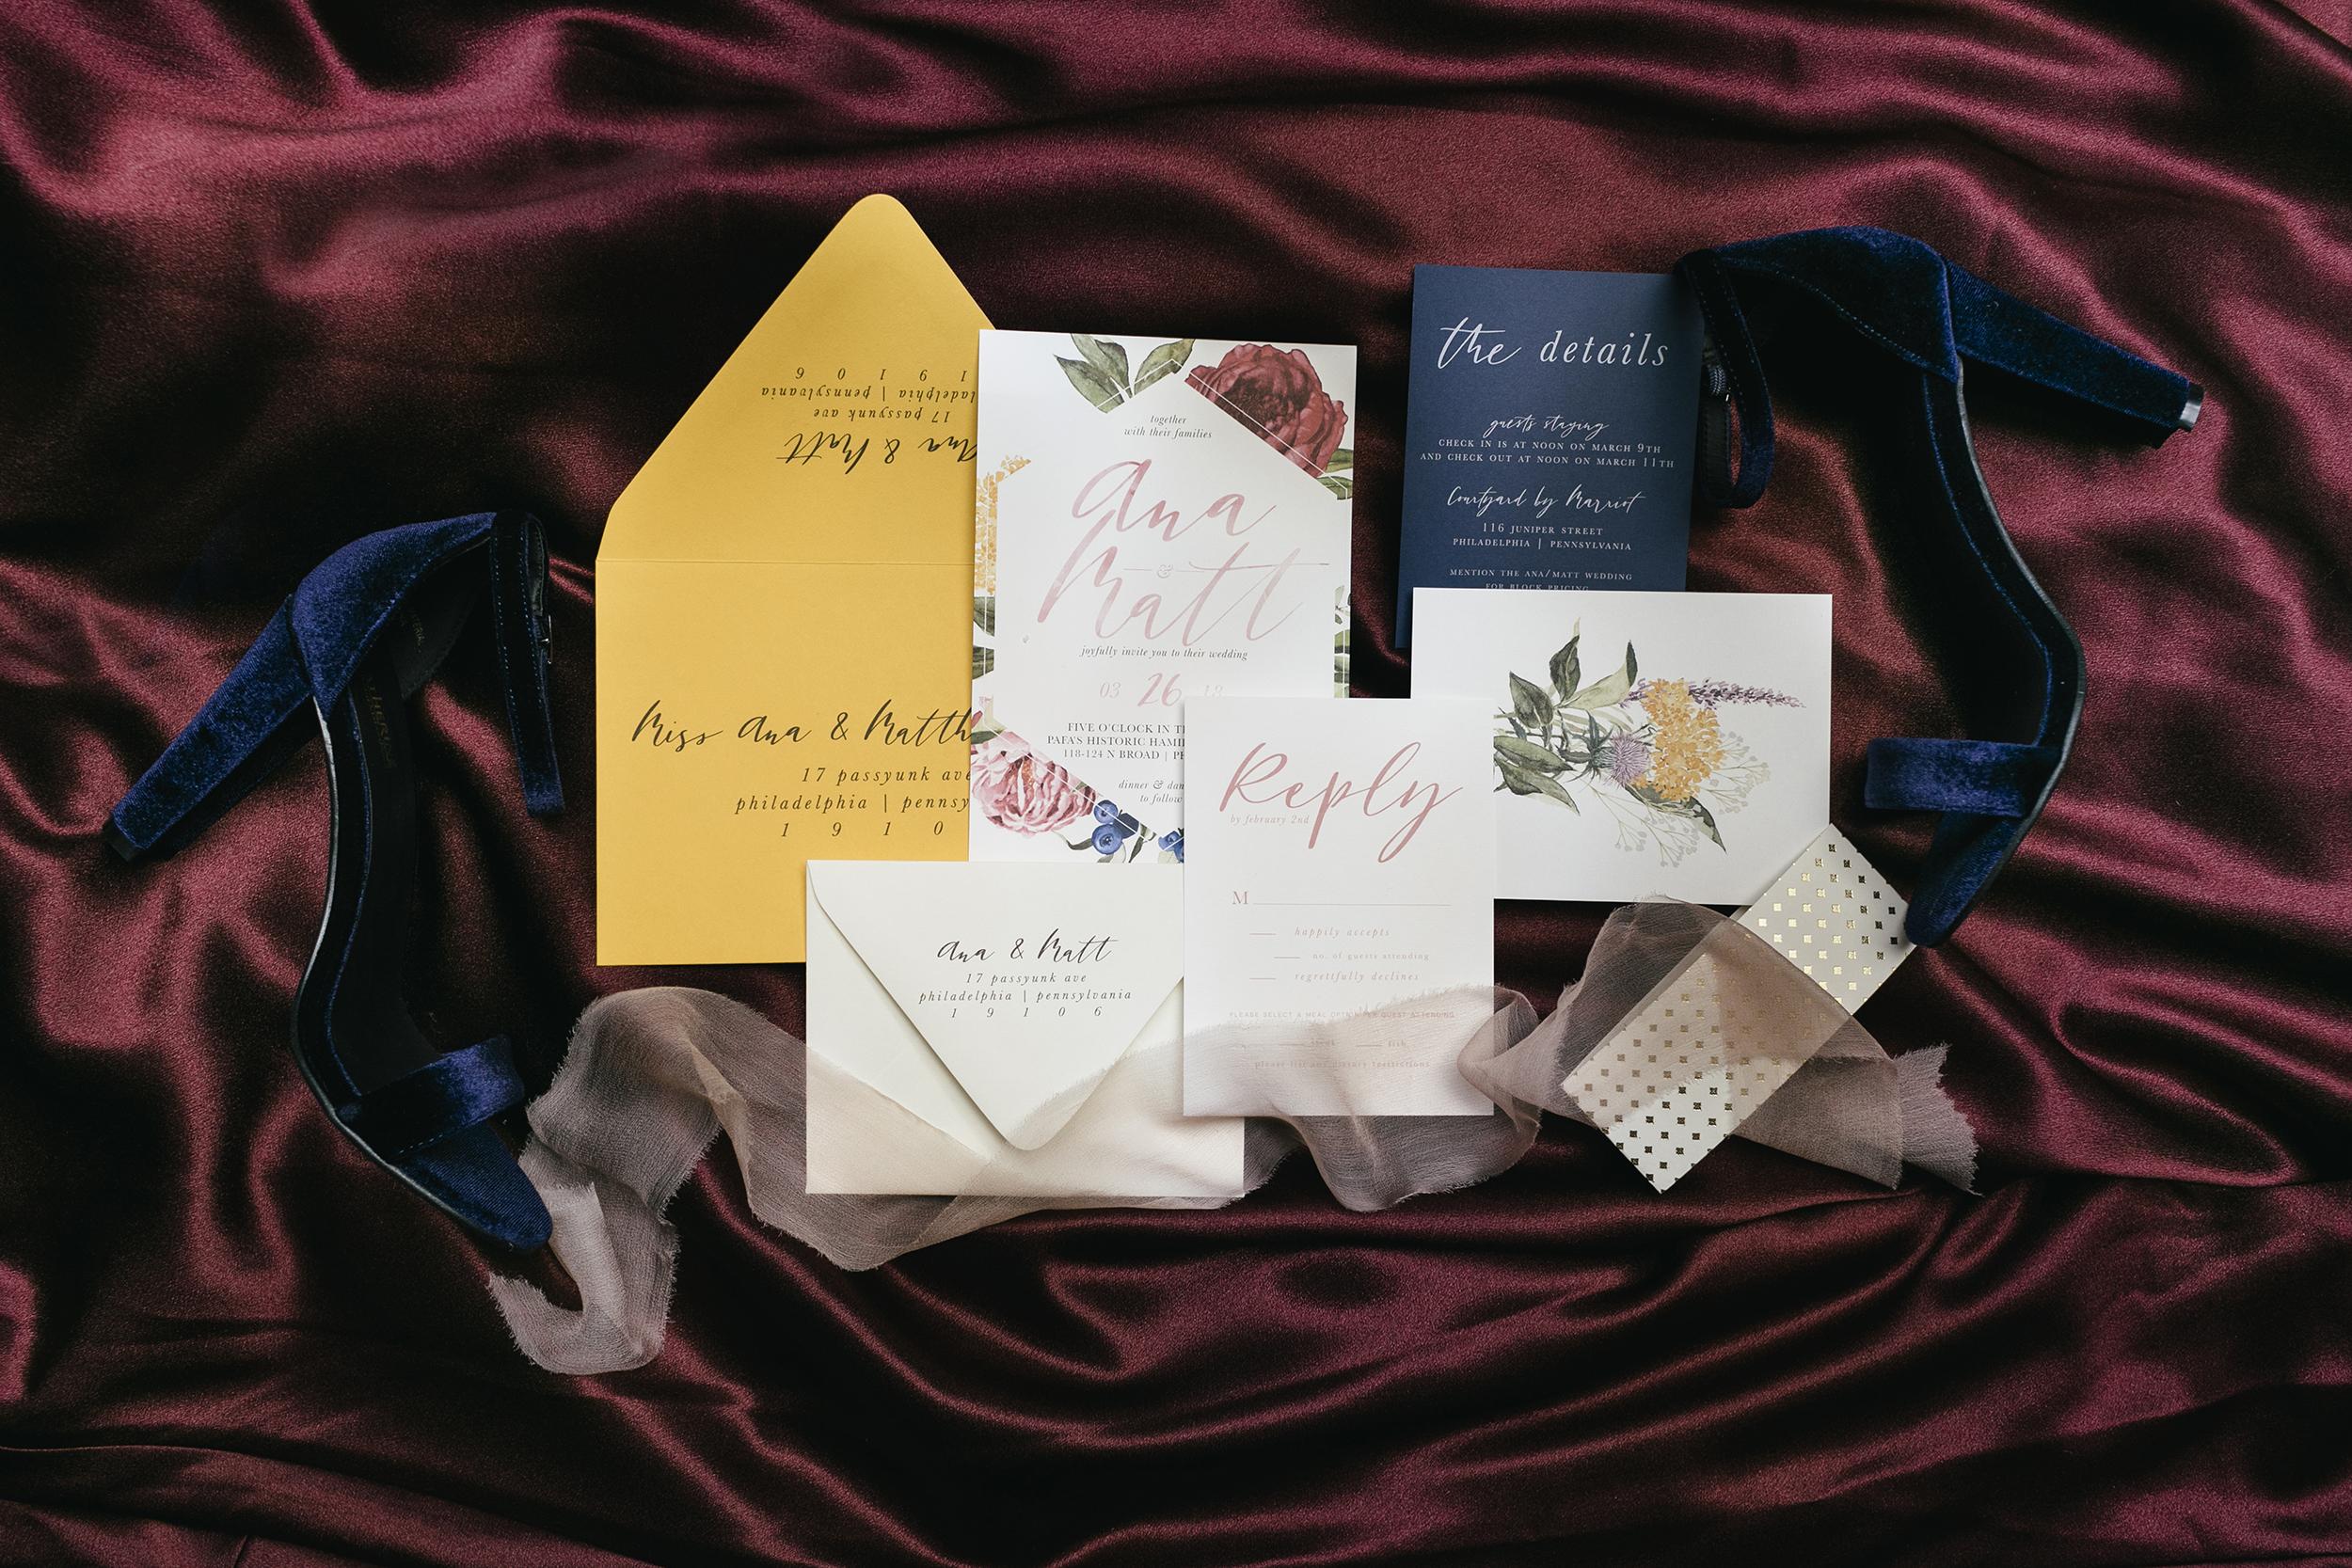 photography-wedding-weddings-natural-candid-pafa-pennsylvania academy-philadephia-philly-philadelphia wedding-mixed race-editorial-modern-fine-art-010.JPG